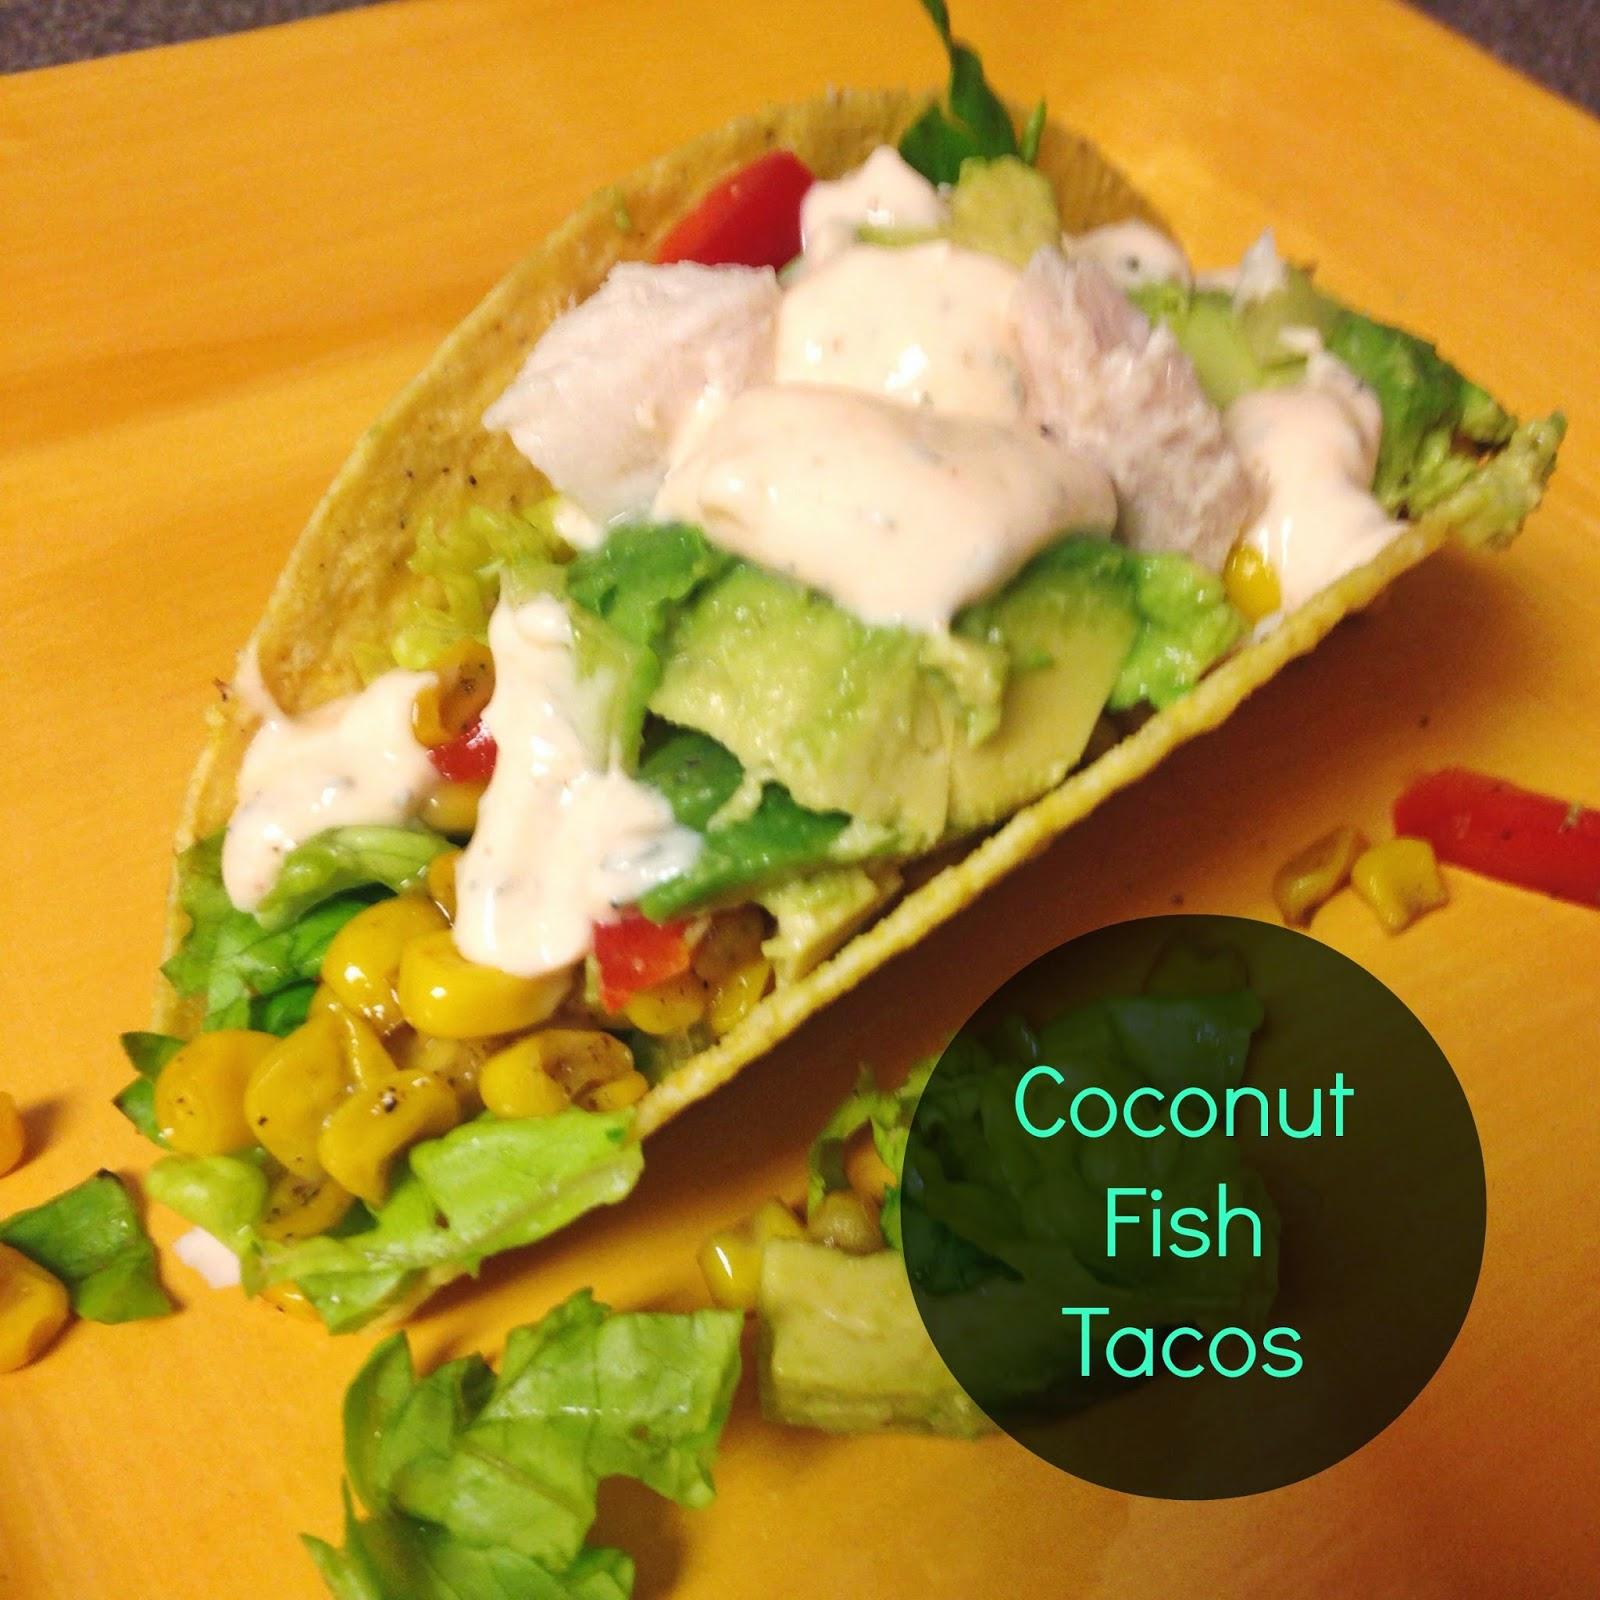 Coconut Fish Tacos